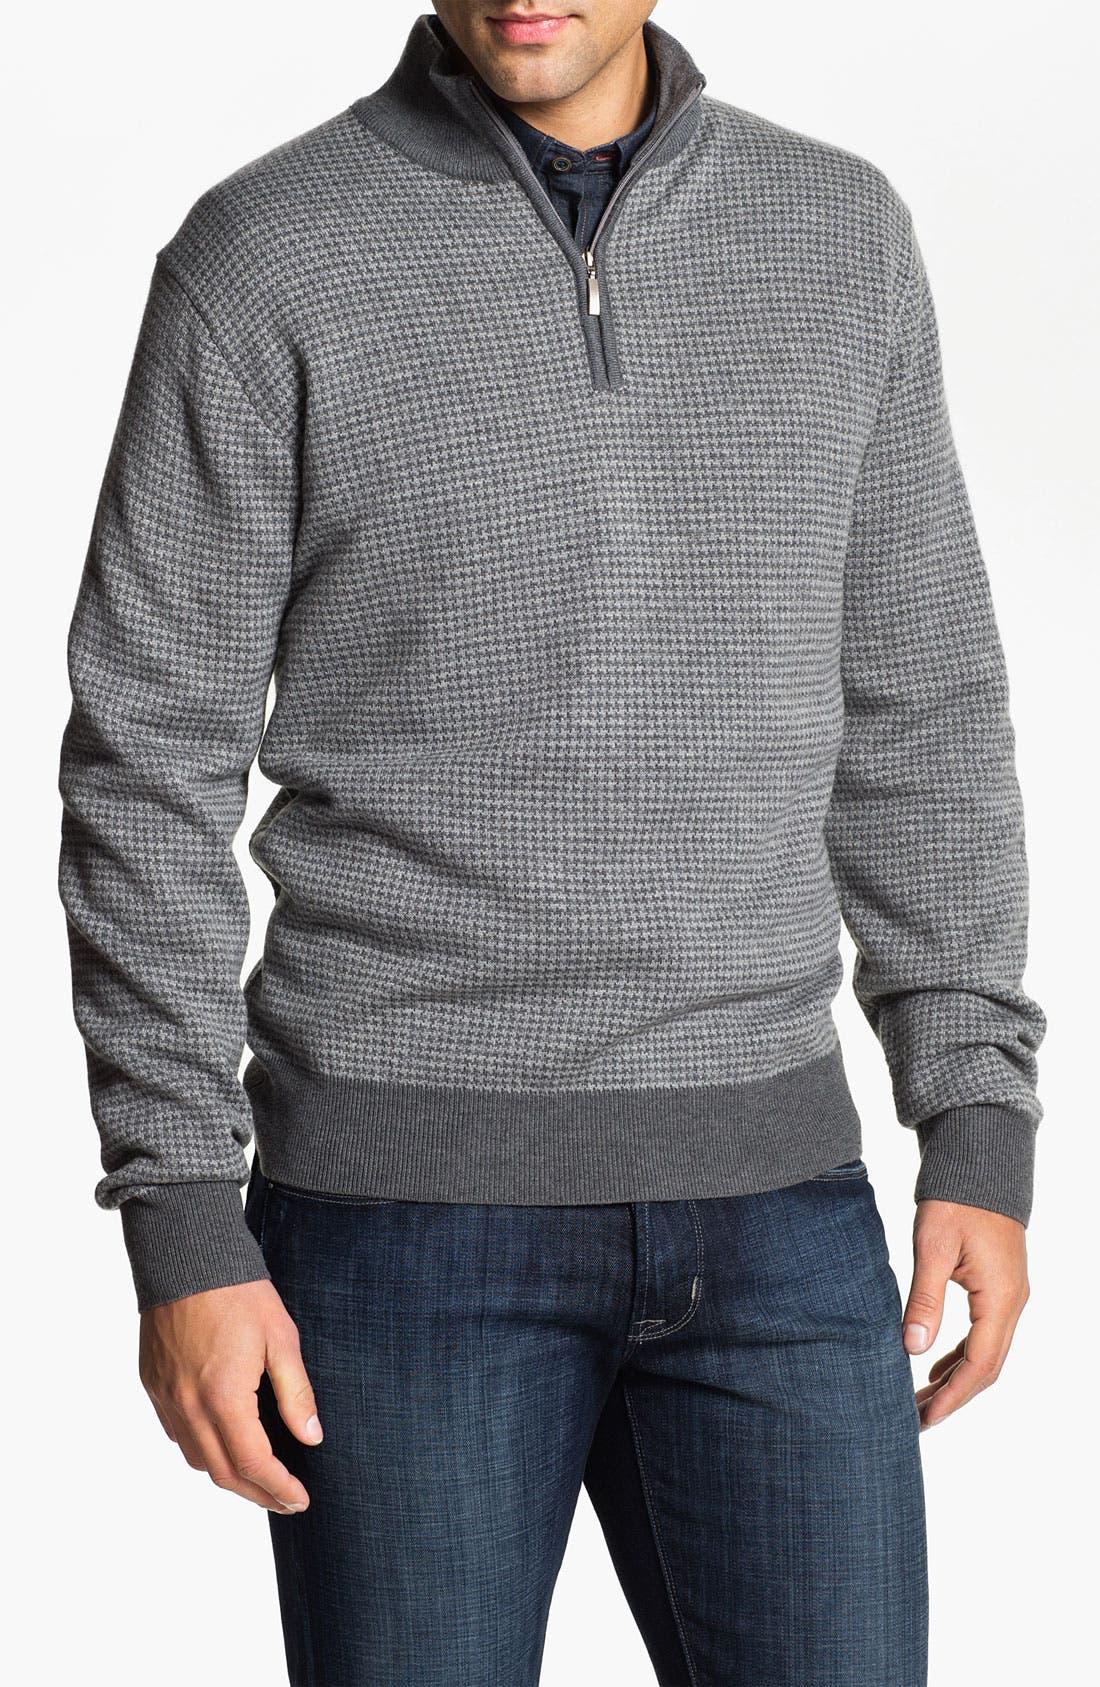 Main Image - Toscano Merino Quarter Zip Wool Blend Sweater